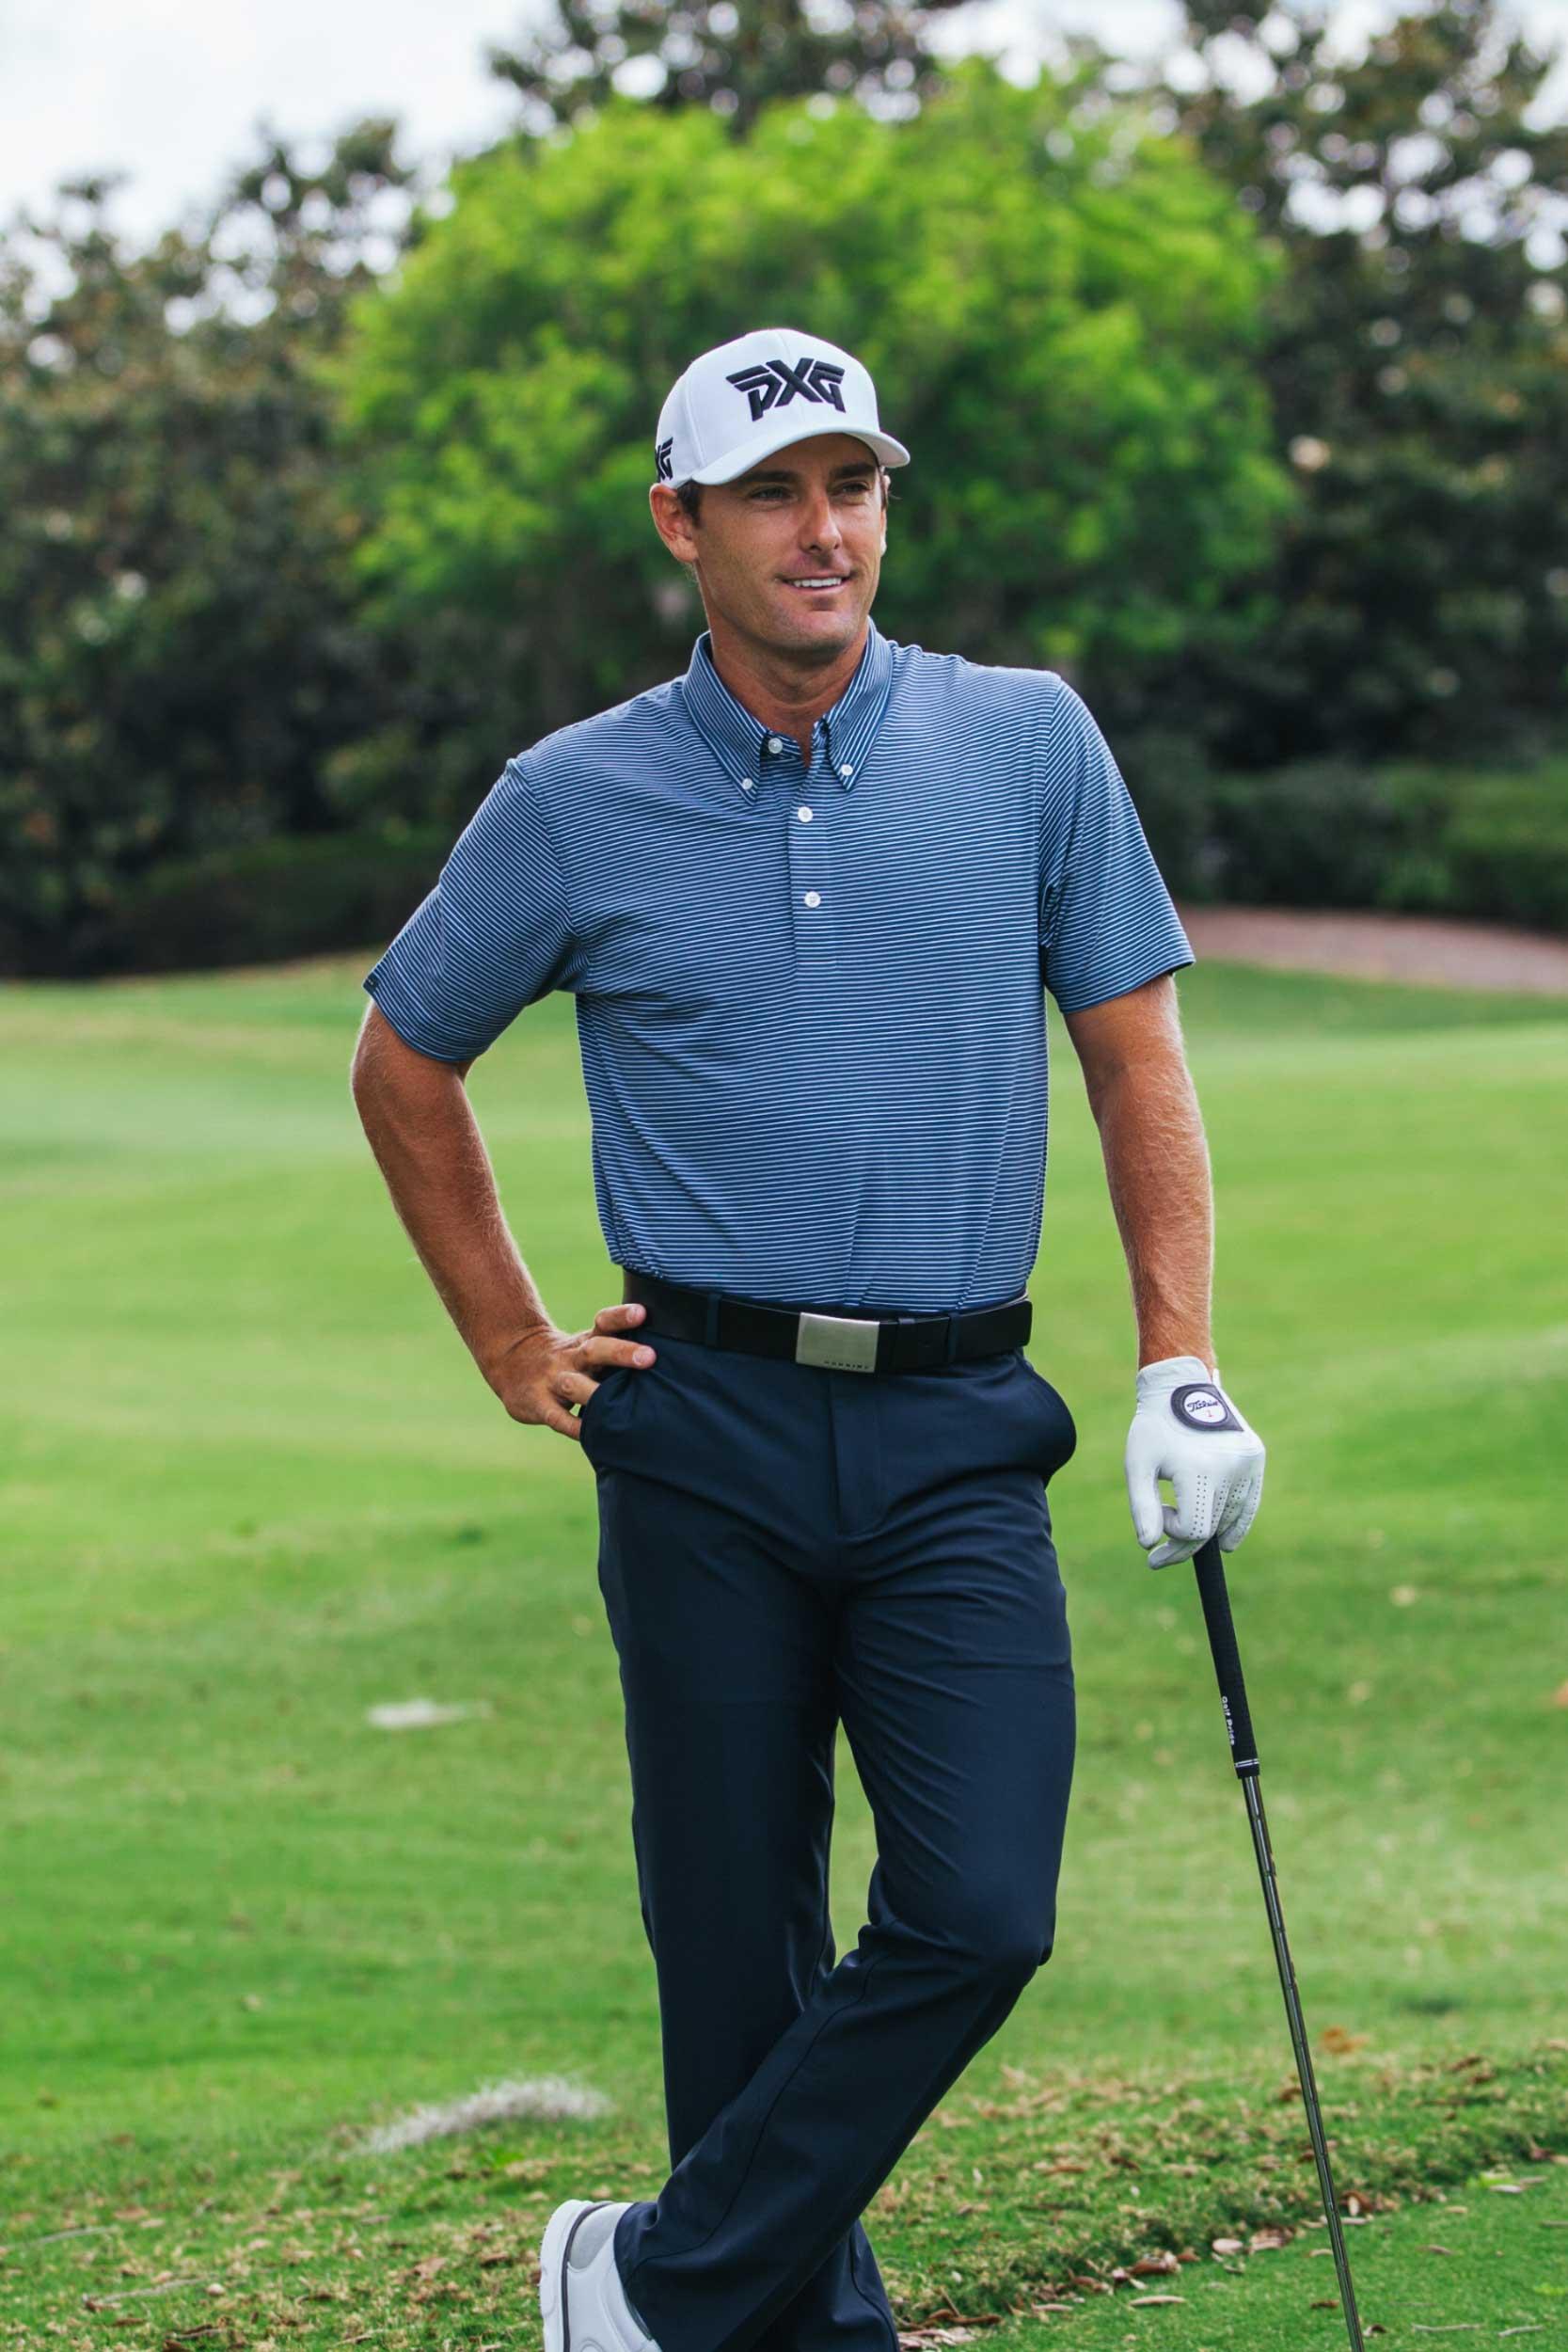 Dunning-Golf-Charles-Howell-Orlando-3